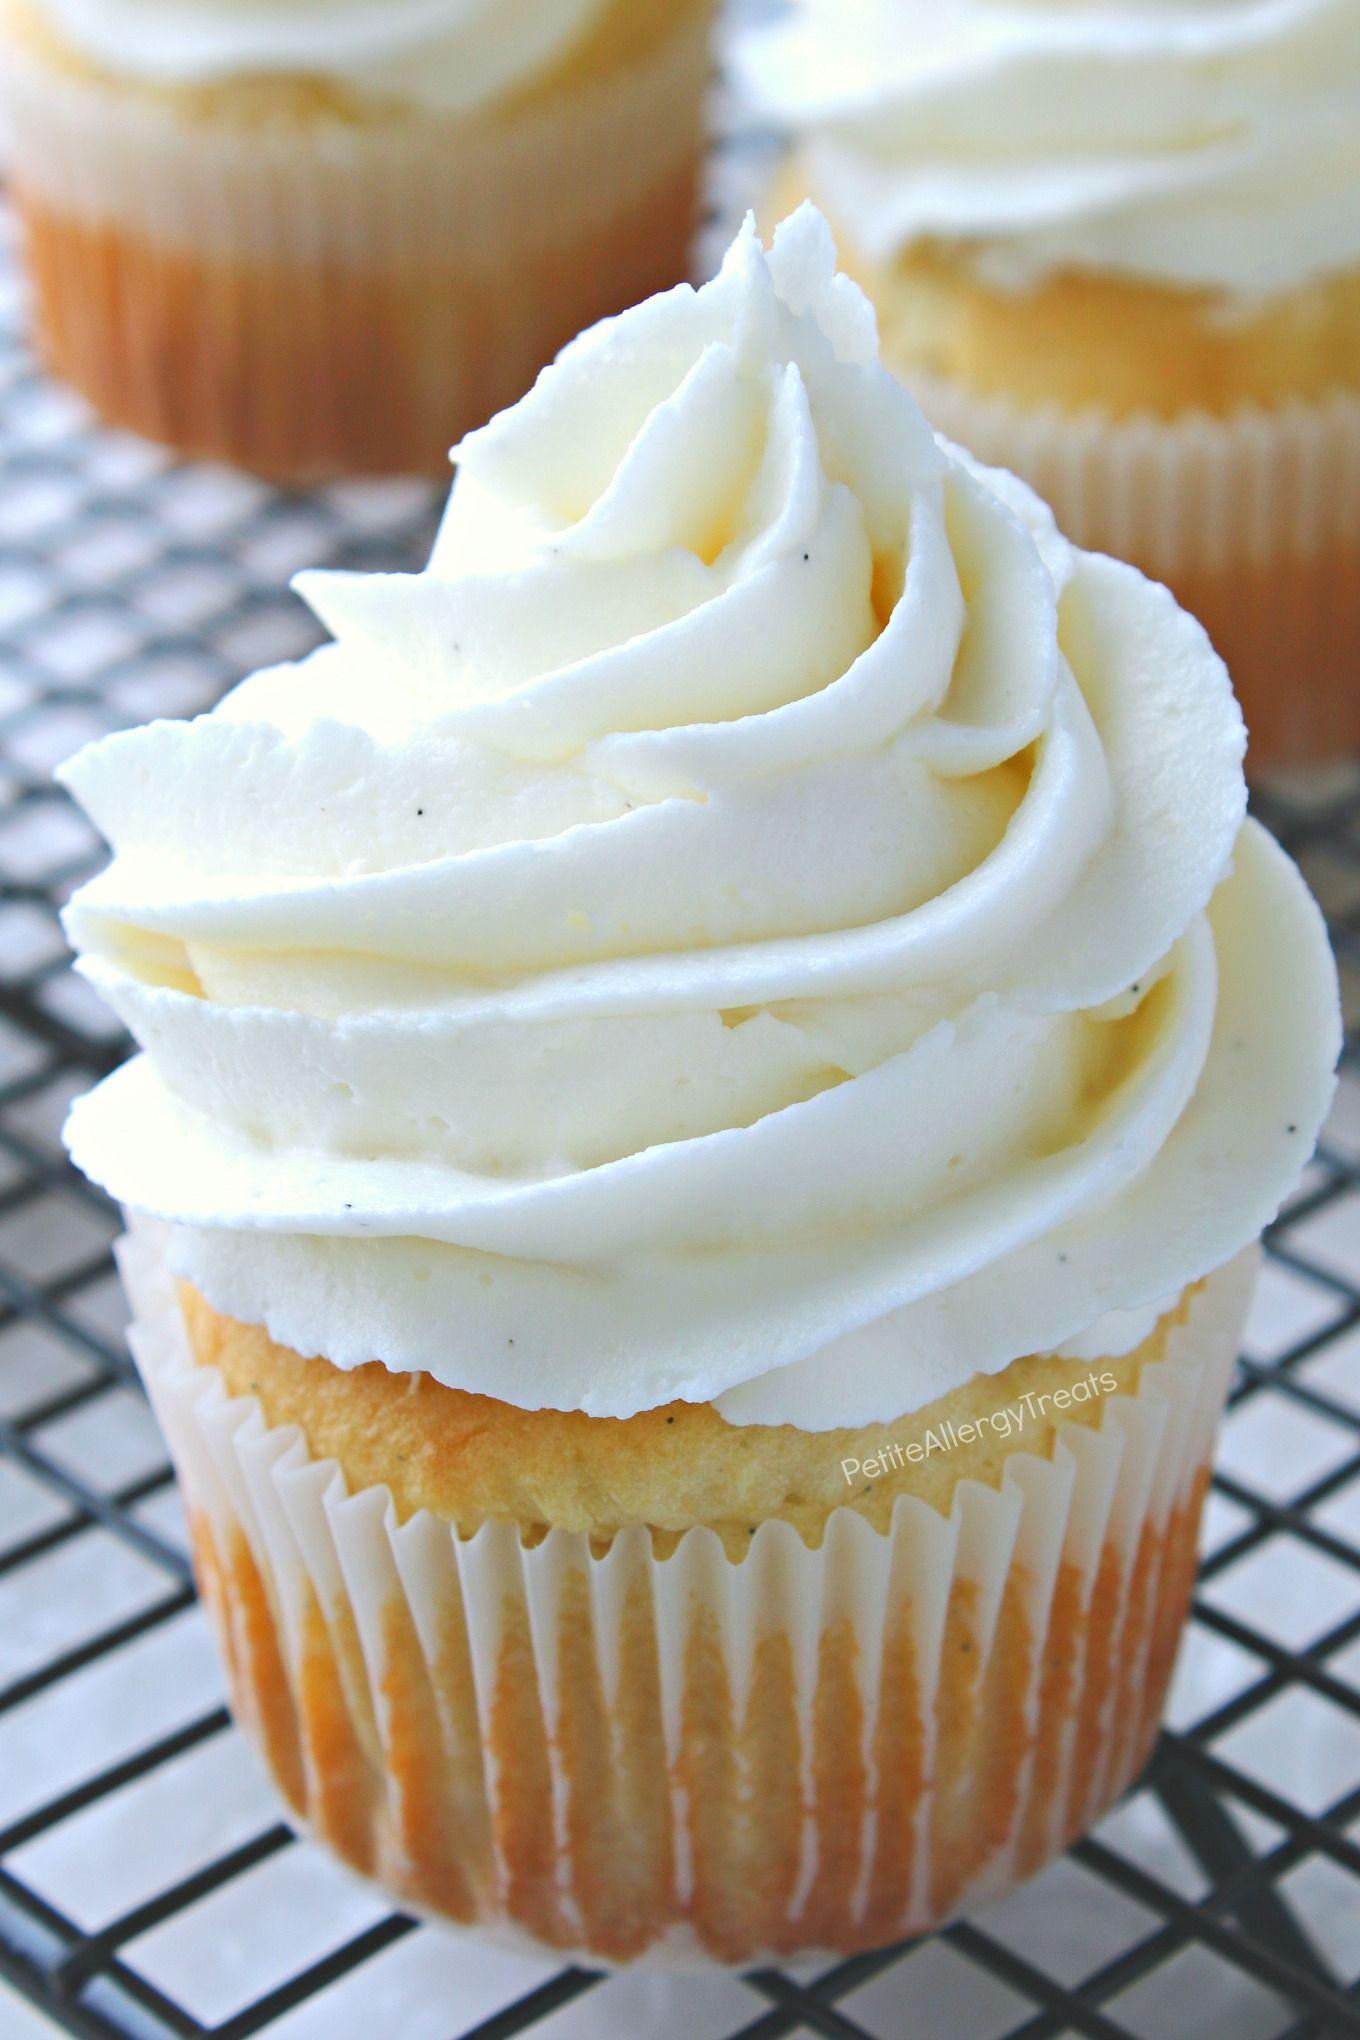 Gluten free vegan vanilla cupcakes recipe dairy free egg free gluten free vegan vanilla cupcakes recipe dairy free egg free bakery style real forumfinder Choice Image